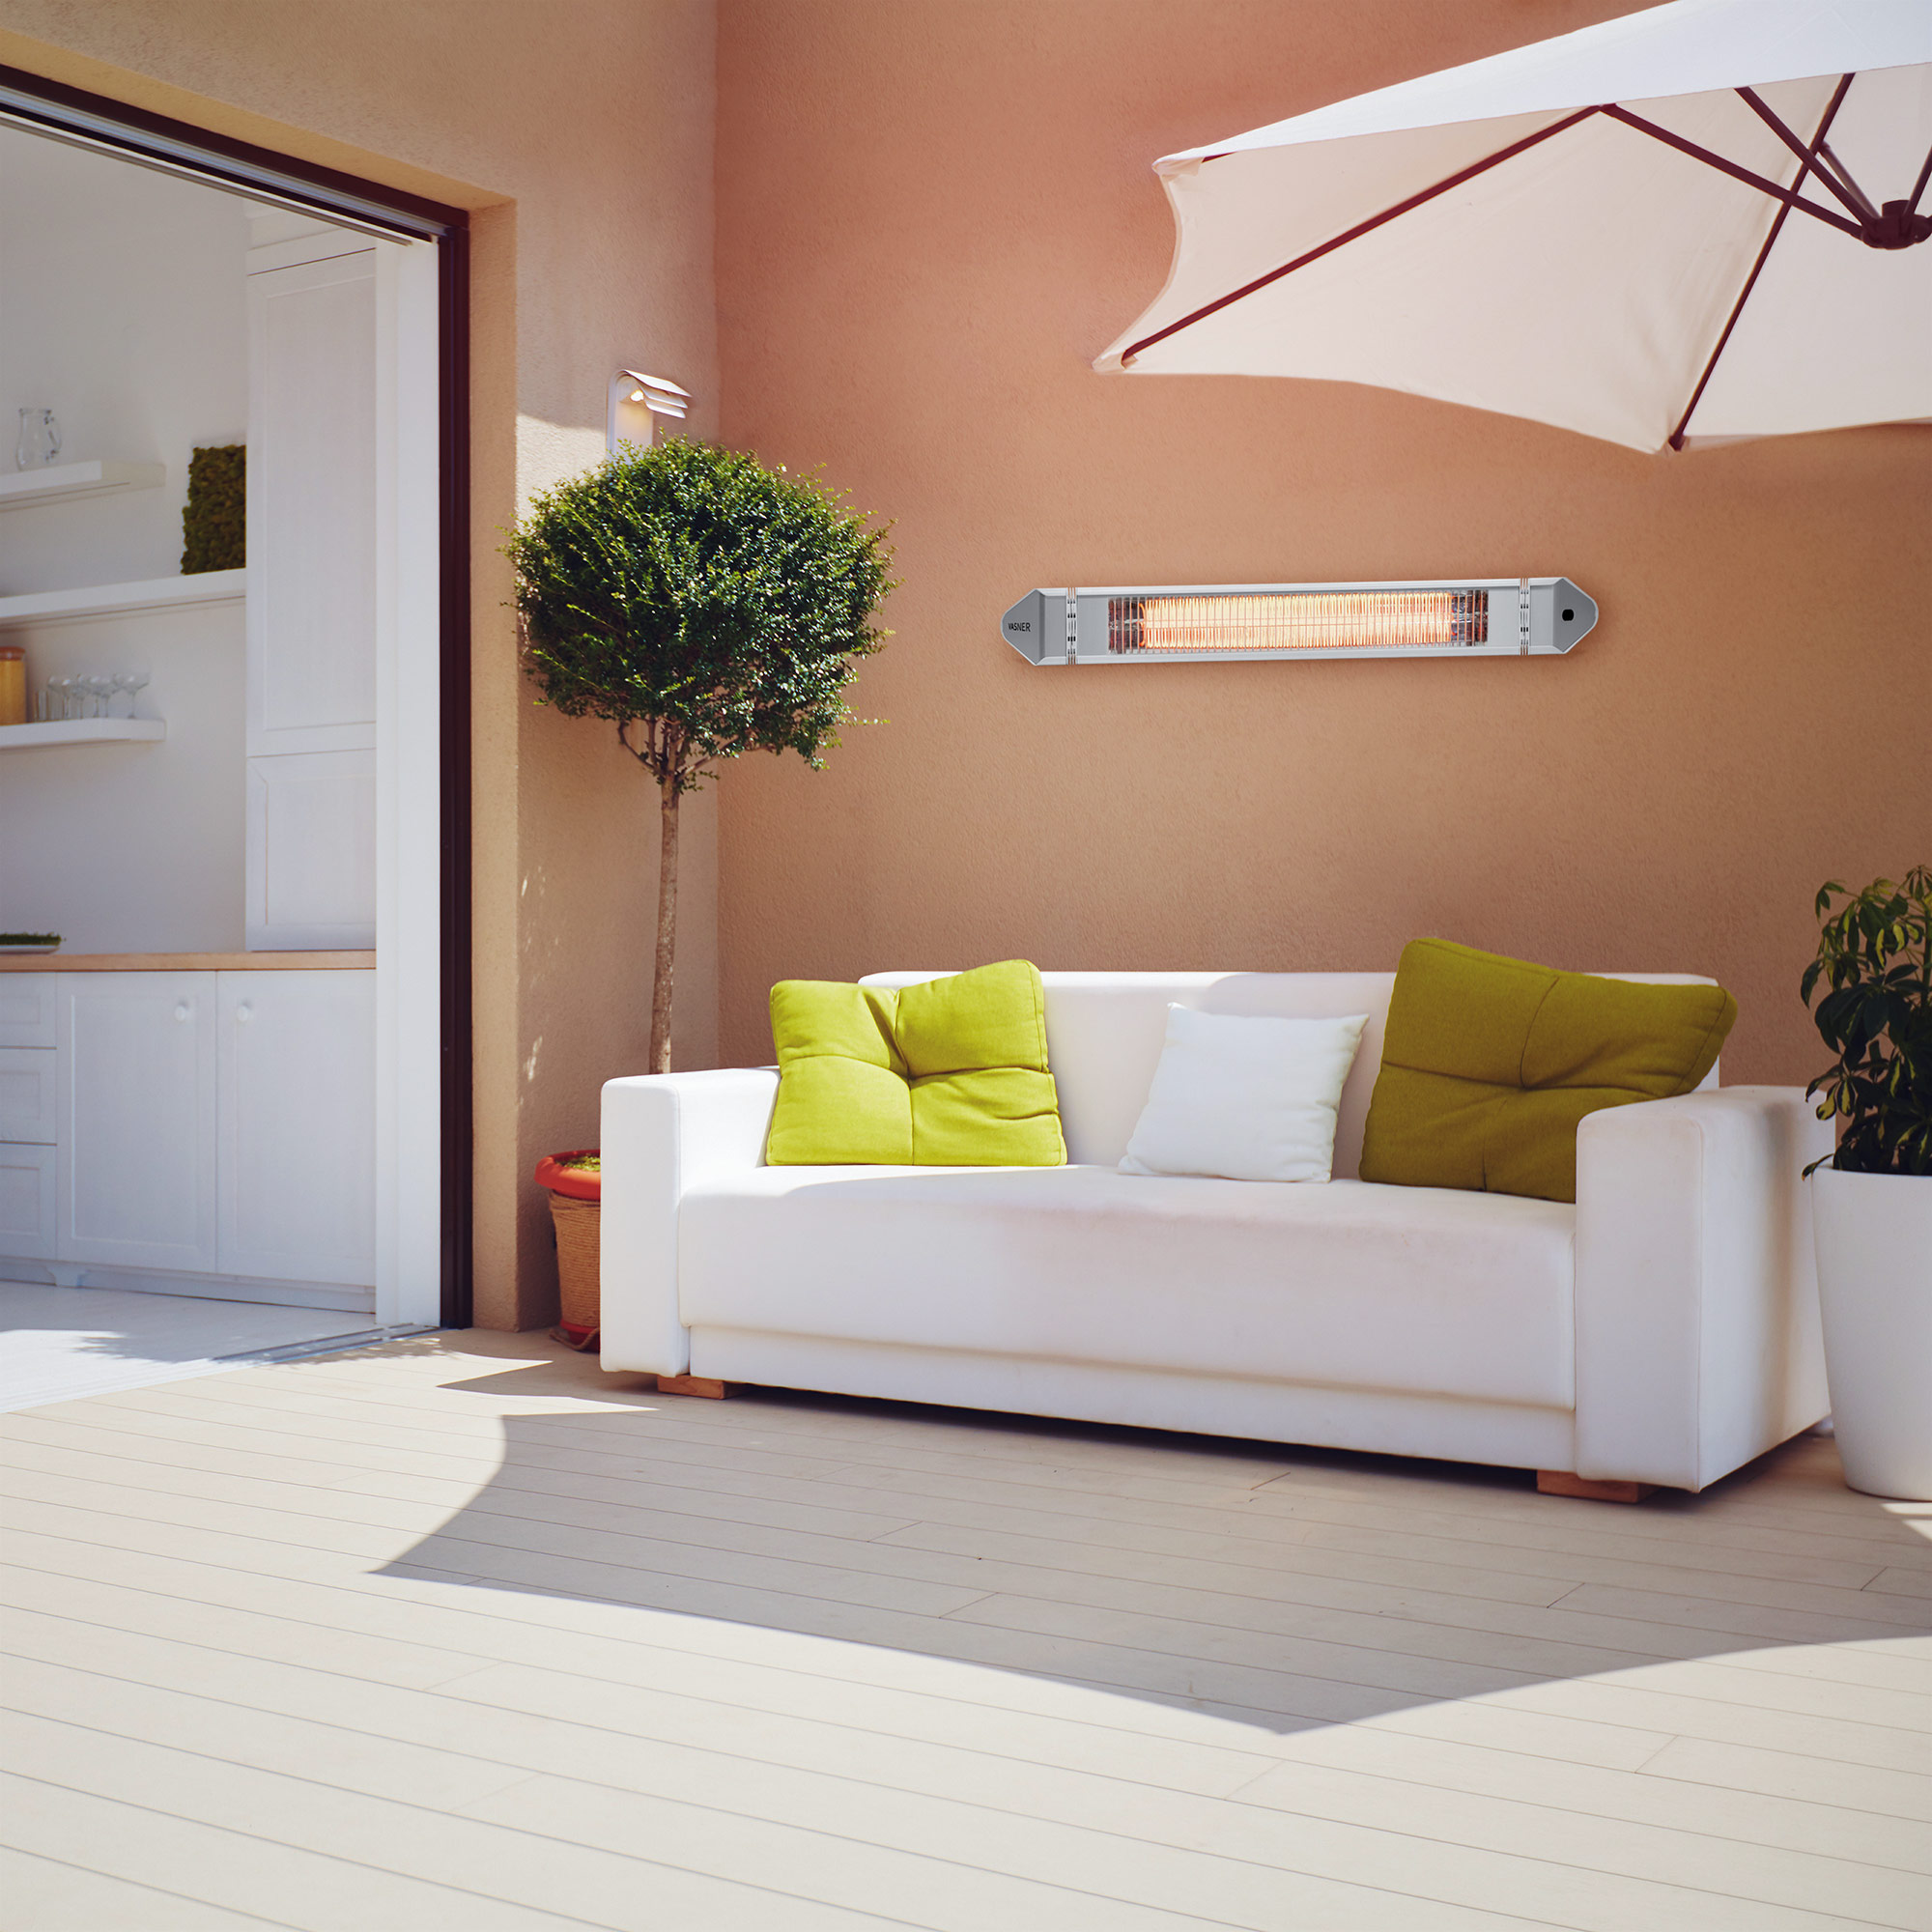 Electric infrared heater for patio, garden, balcony